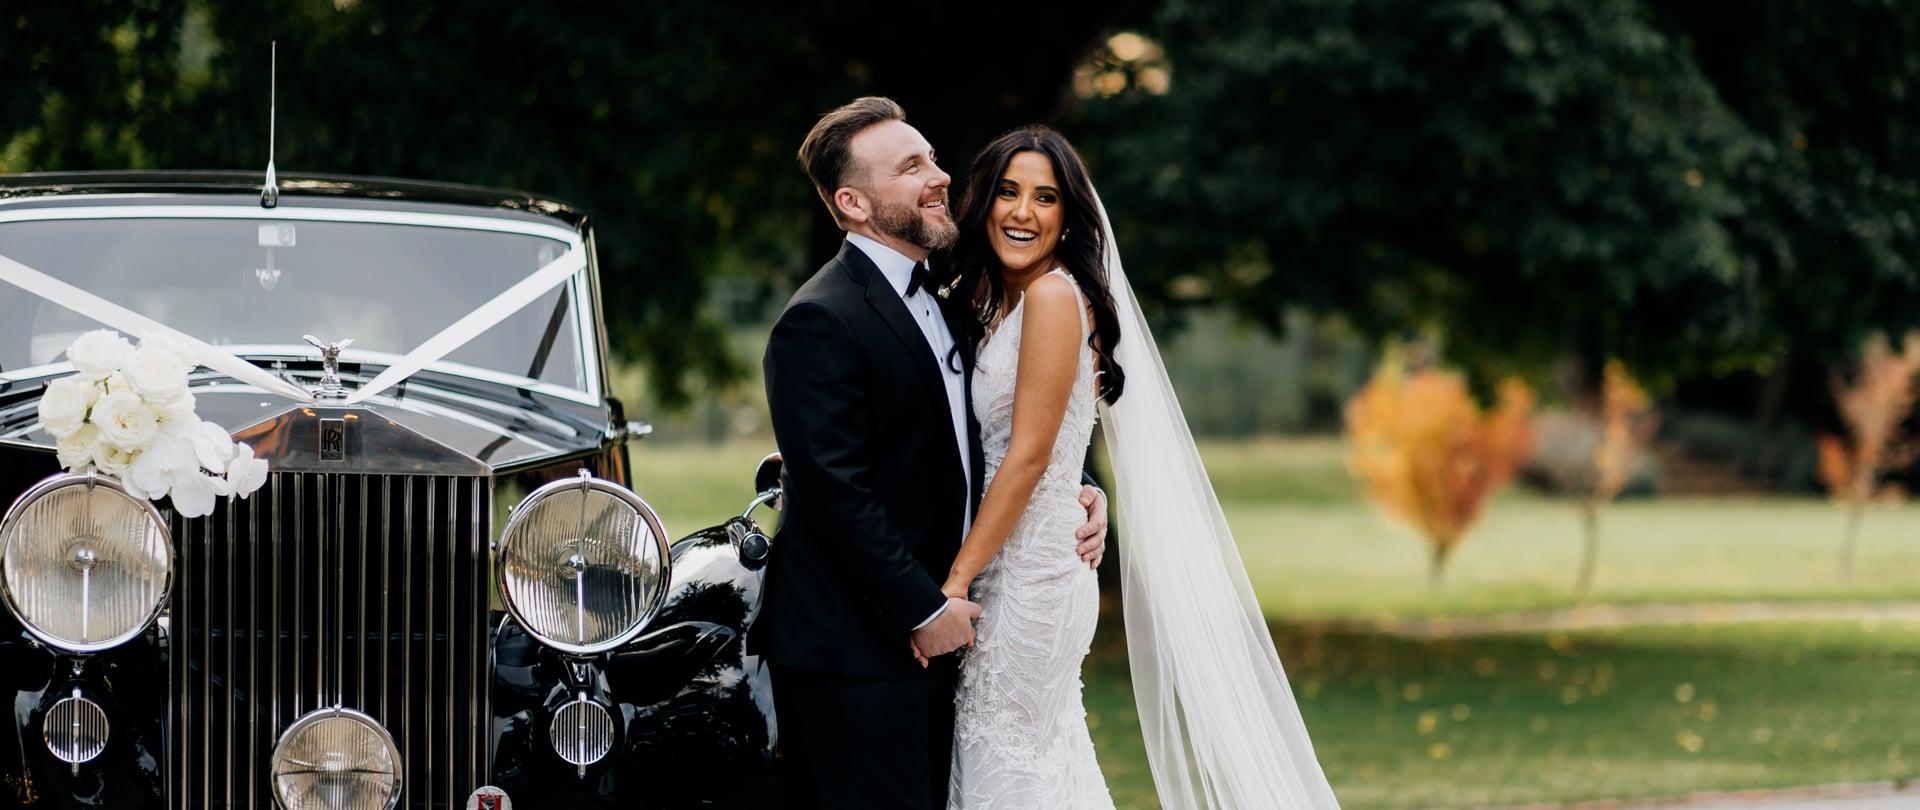 Janet & Allister Wedding Video Filmed at Yarra Valley, Victoria